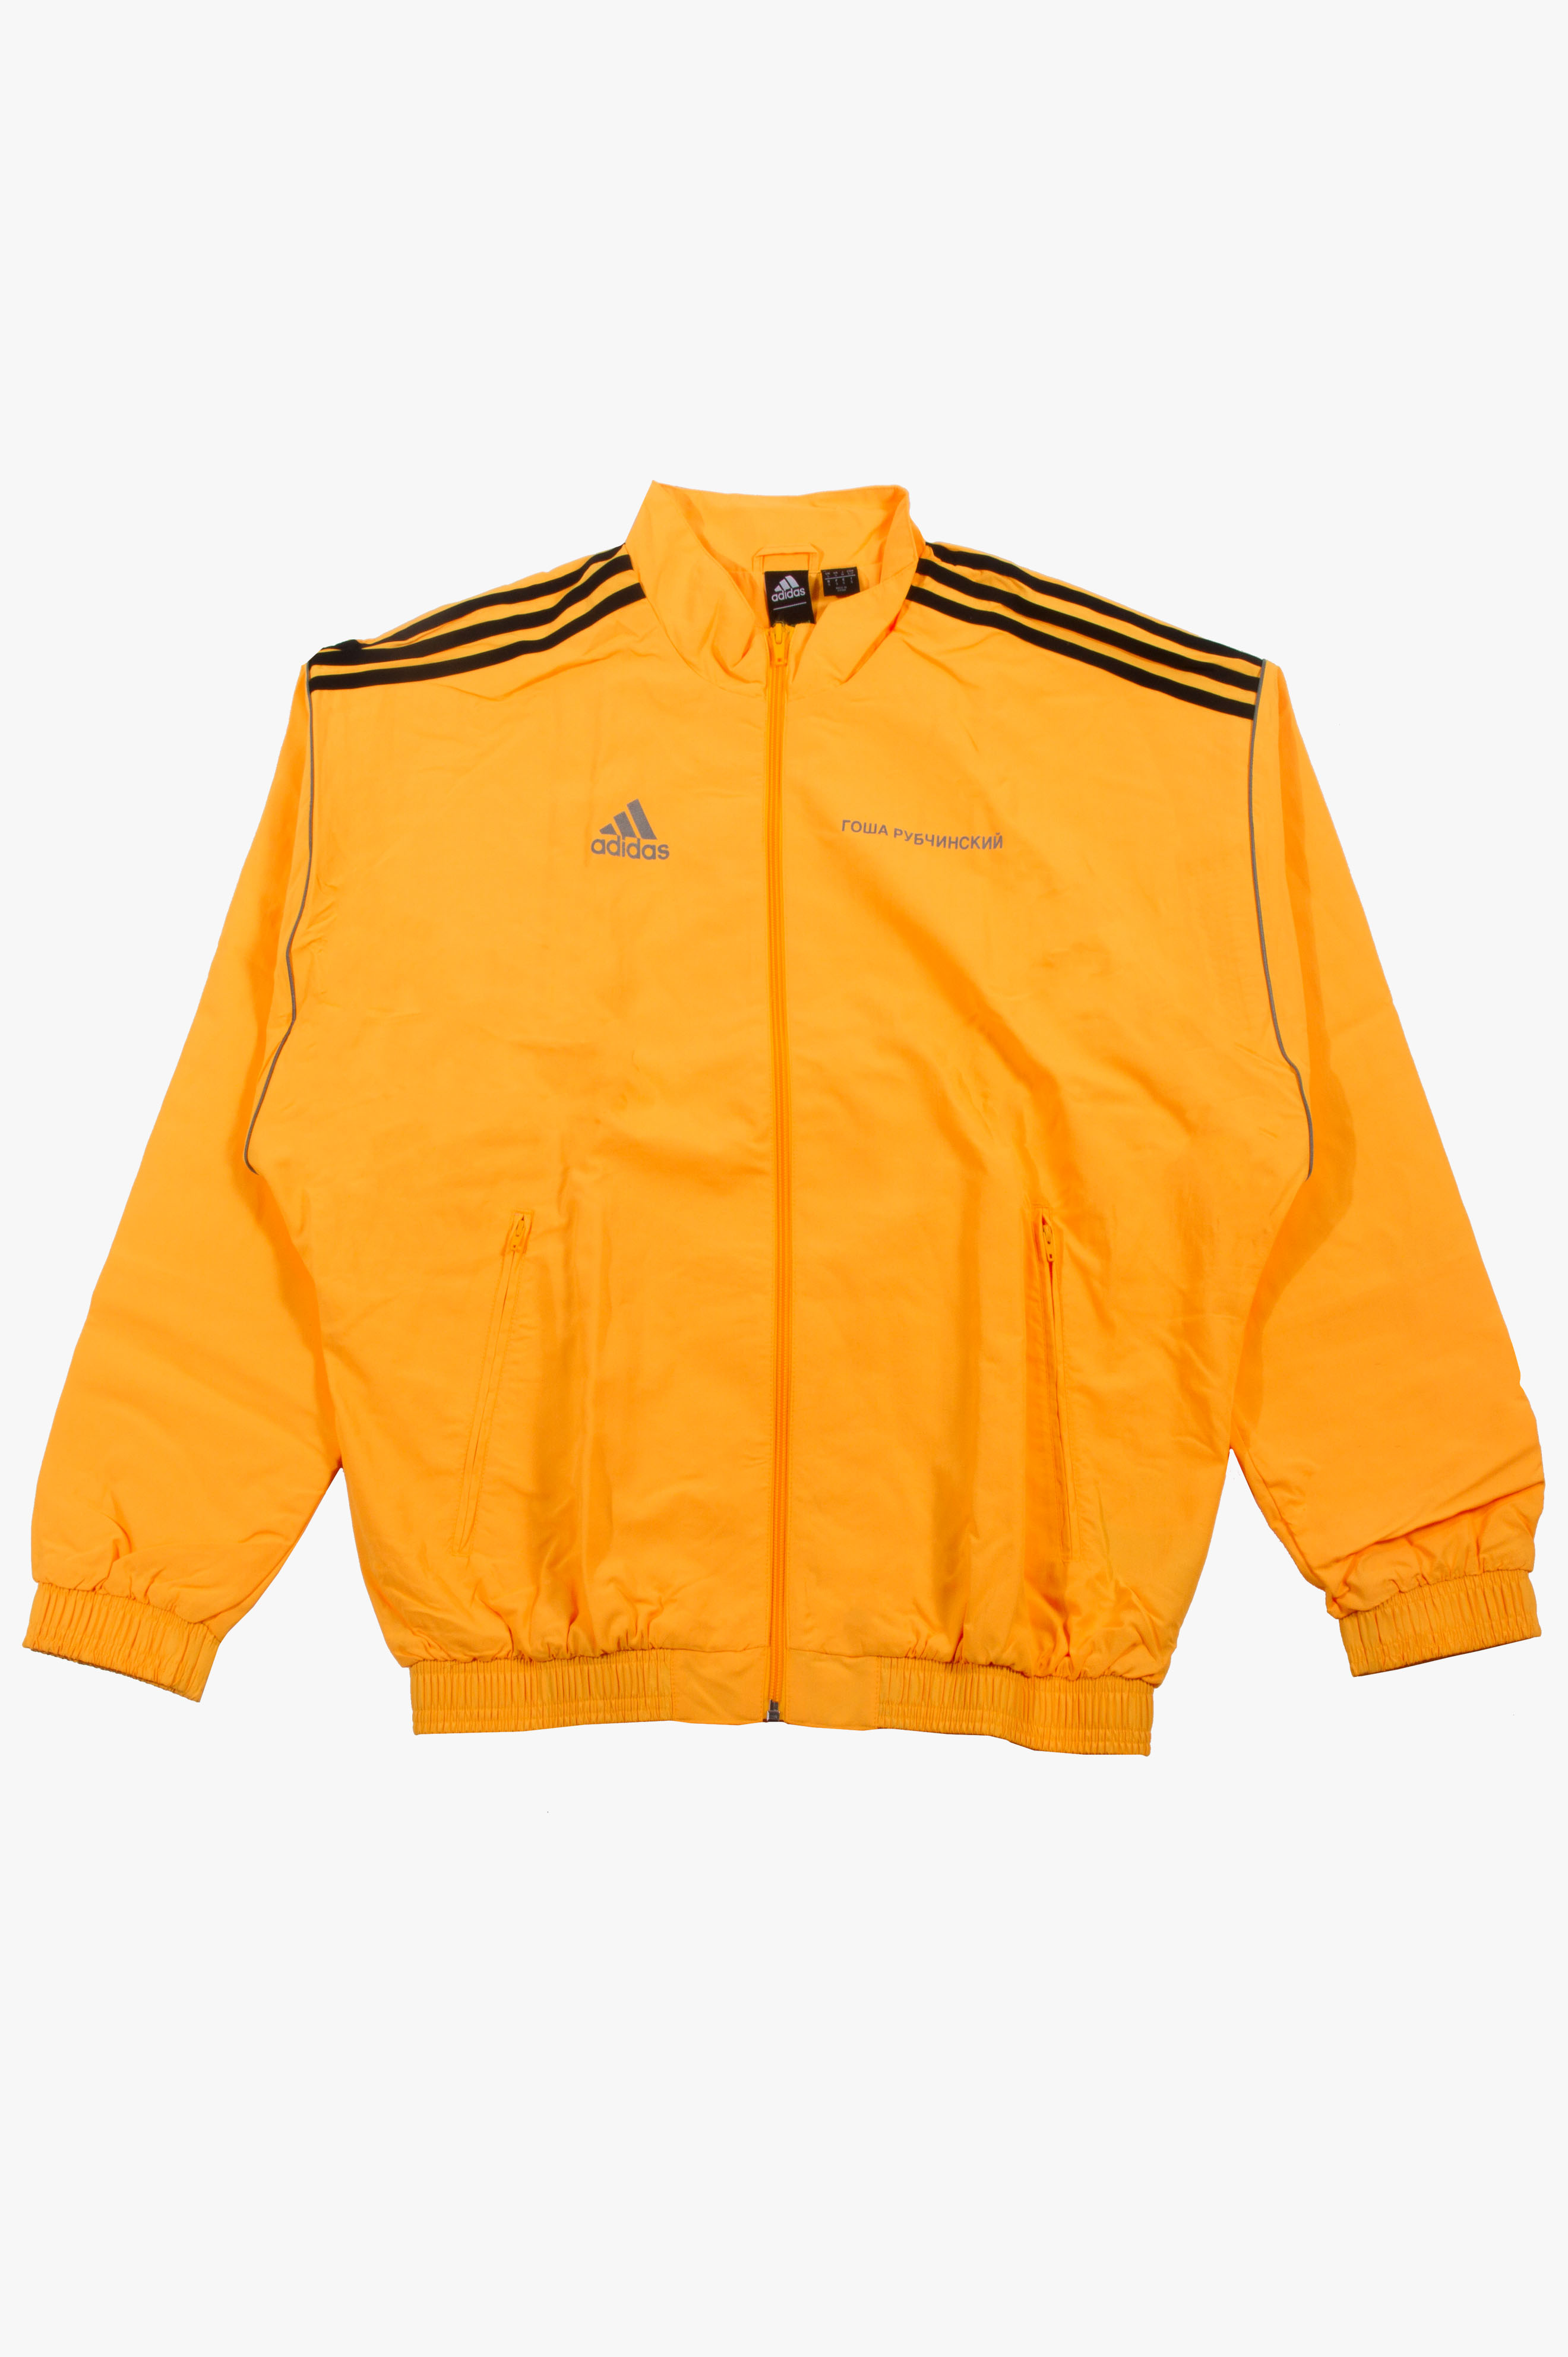 x Adidas Tracktop Orange